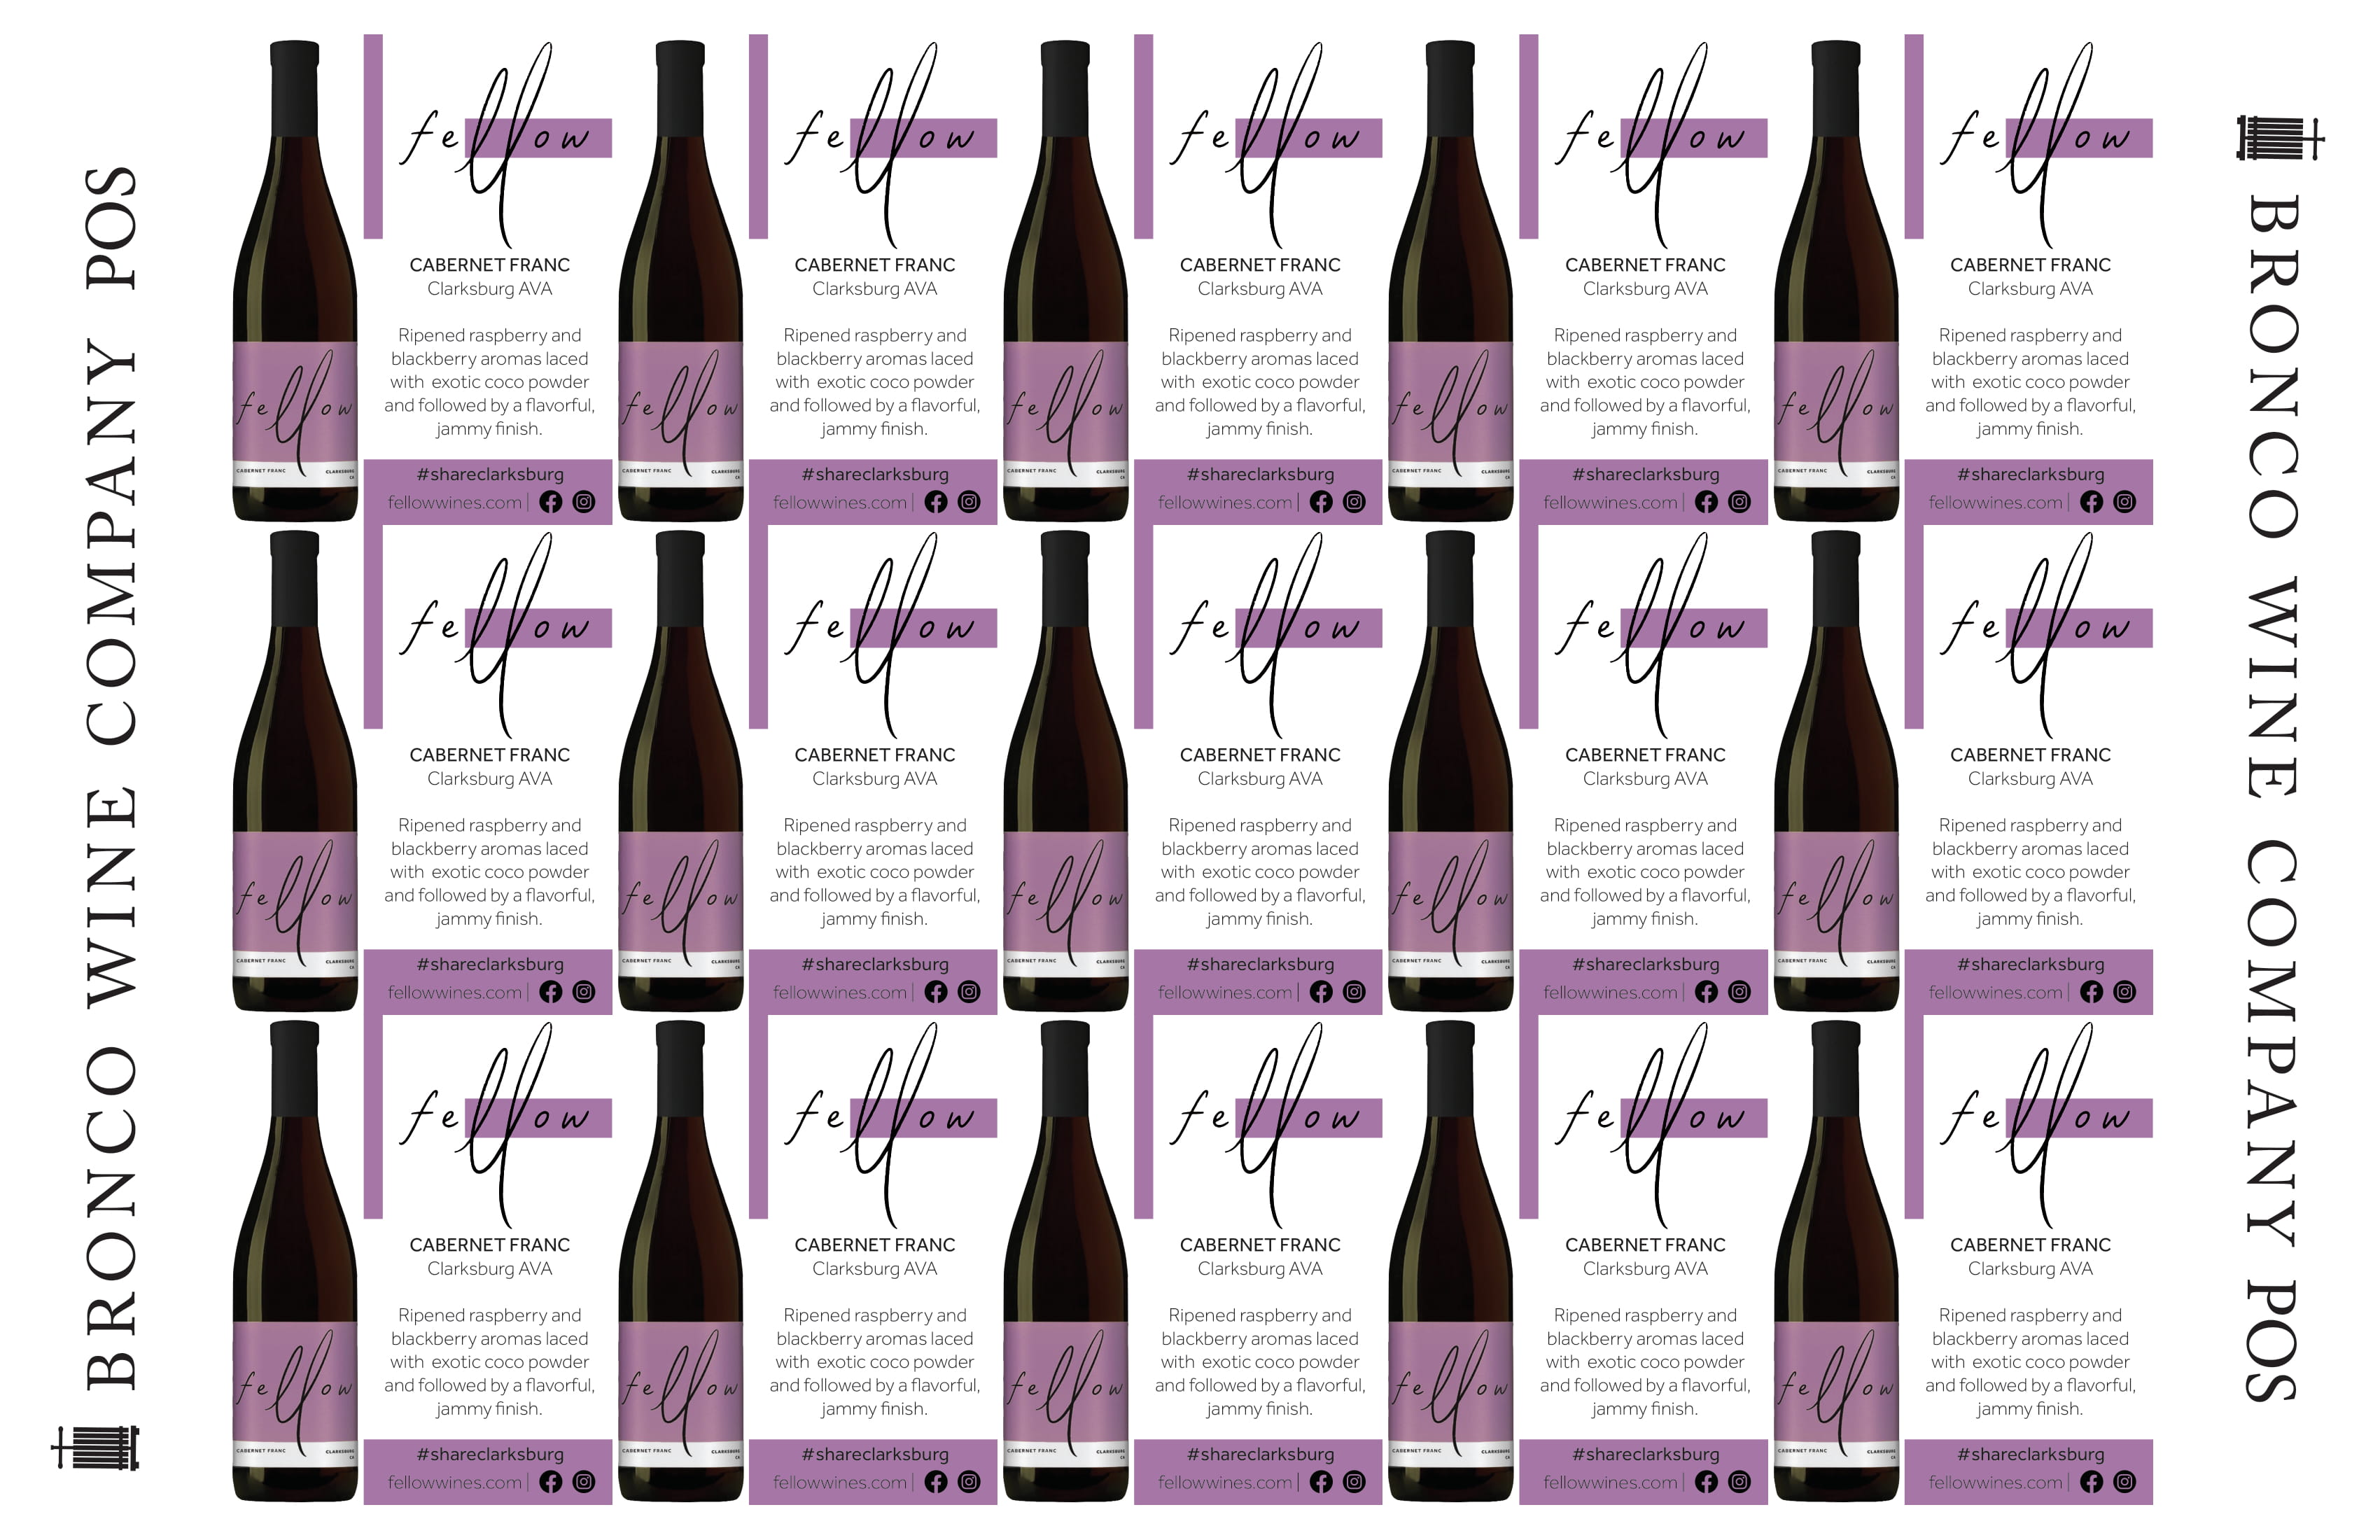 Fellow Wines Cabernet Franc Shelf Talker